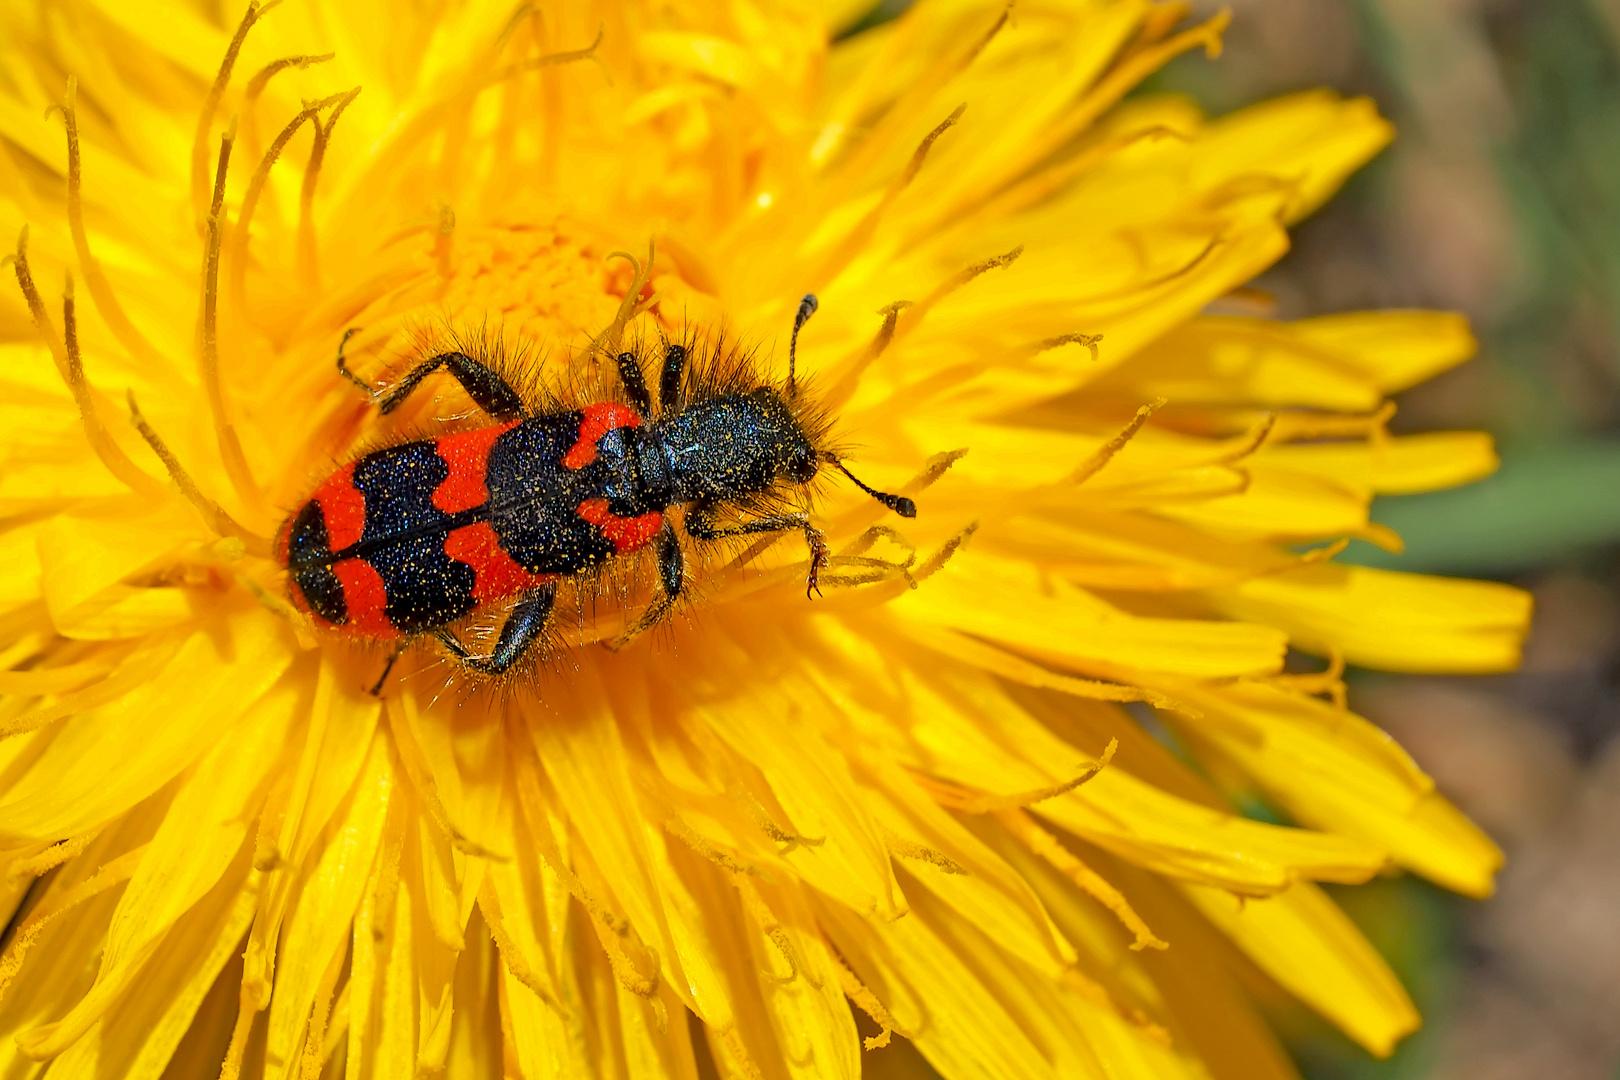 Zottiger Bienenkäfer (Trichodes alvearius) - Trichode des ruches ou clairon.